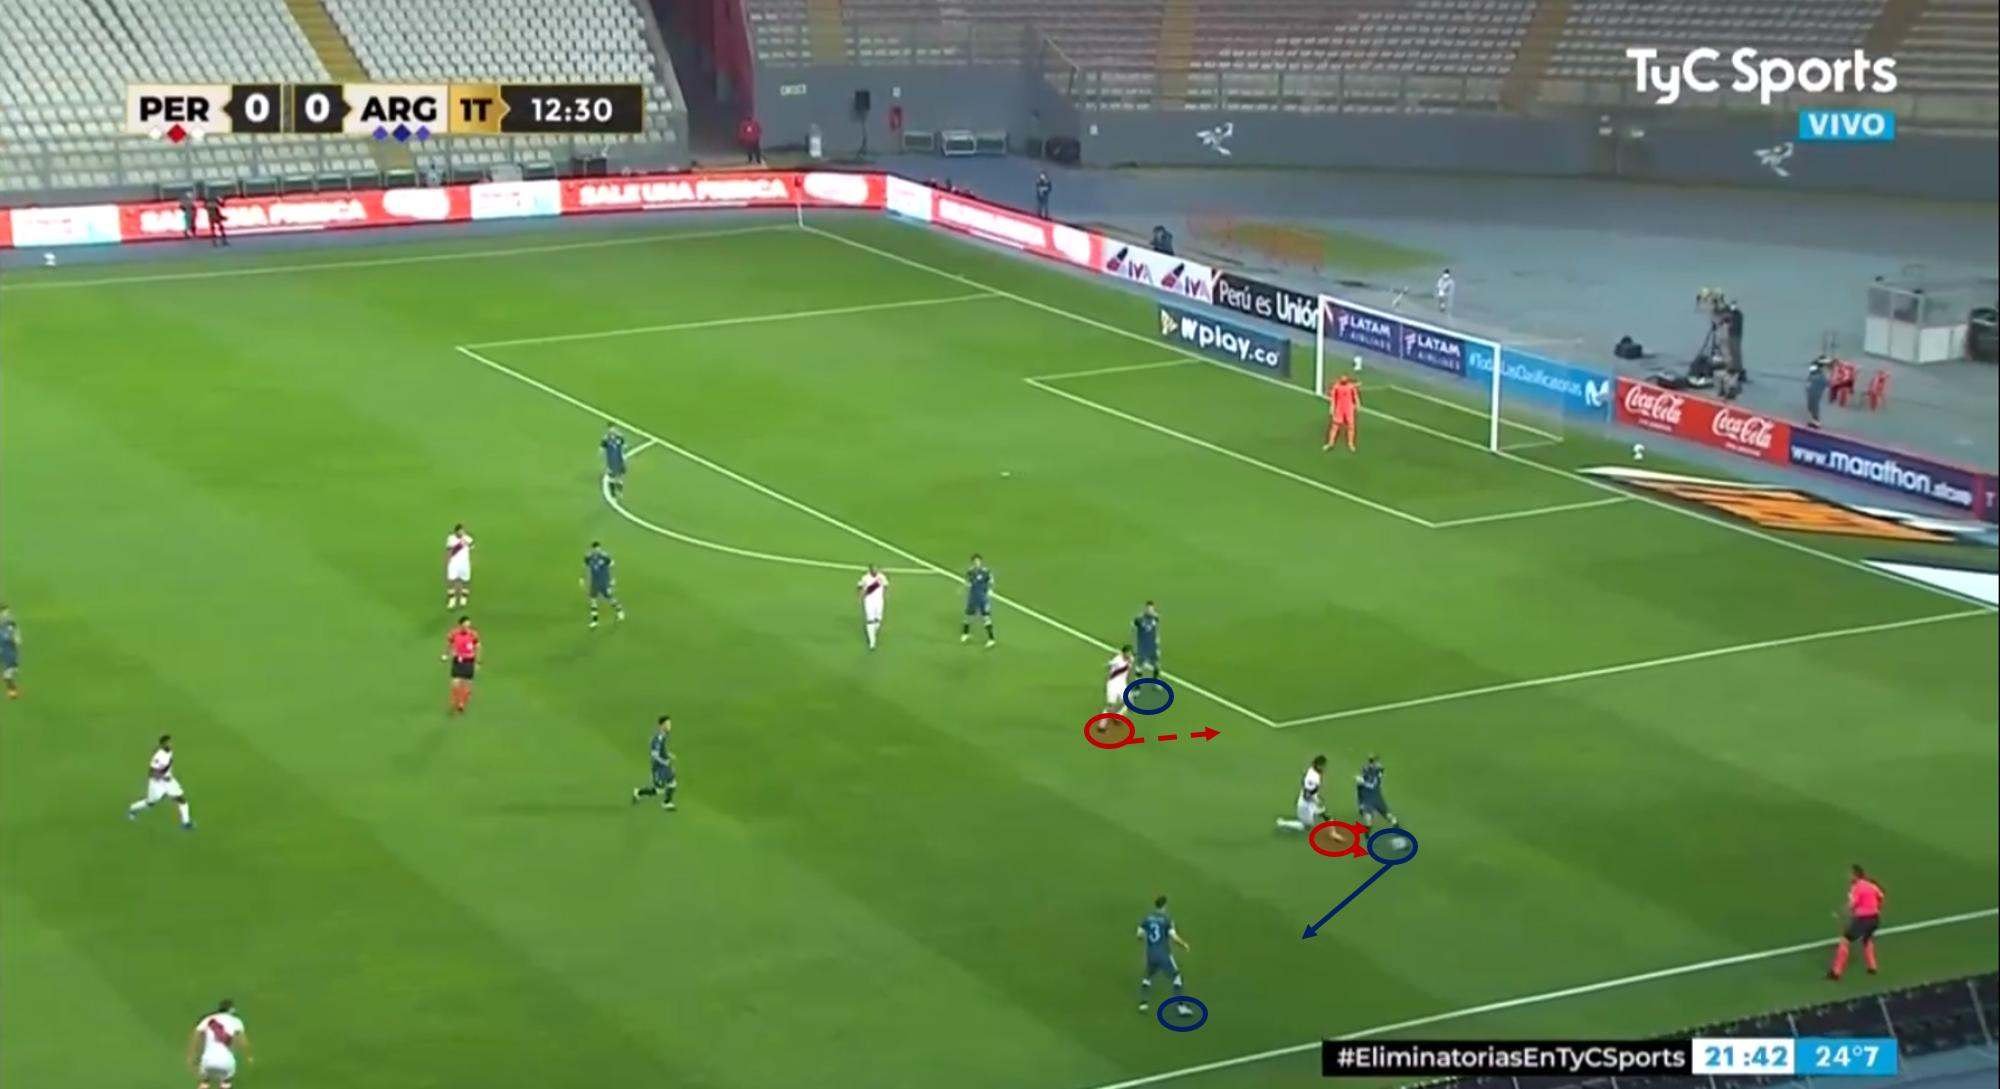 Peru 2020/21: Their tactics at Copa America 2021 - scout report - tactical analysis tactics